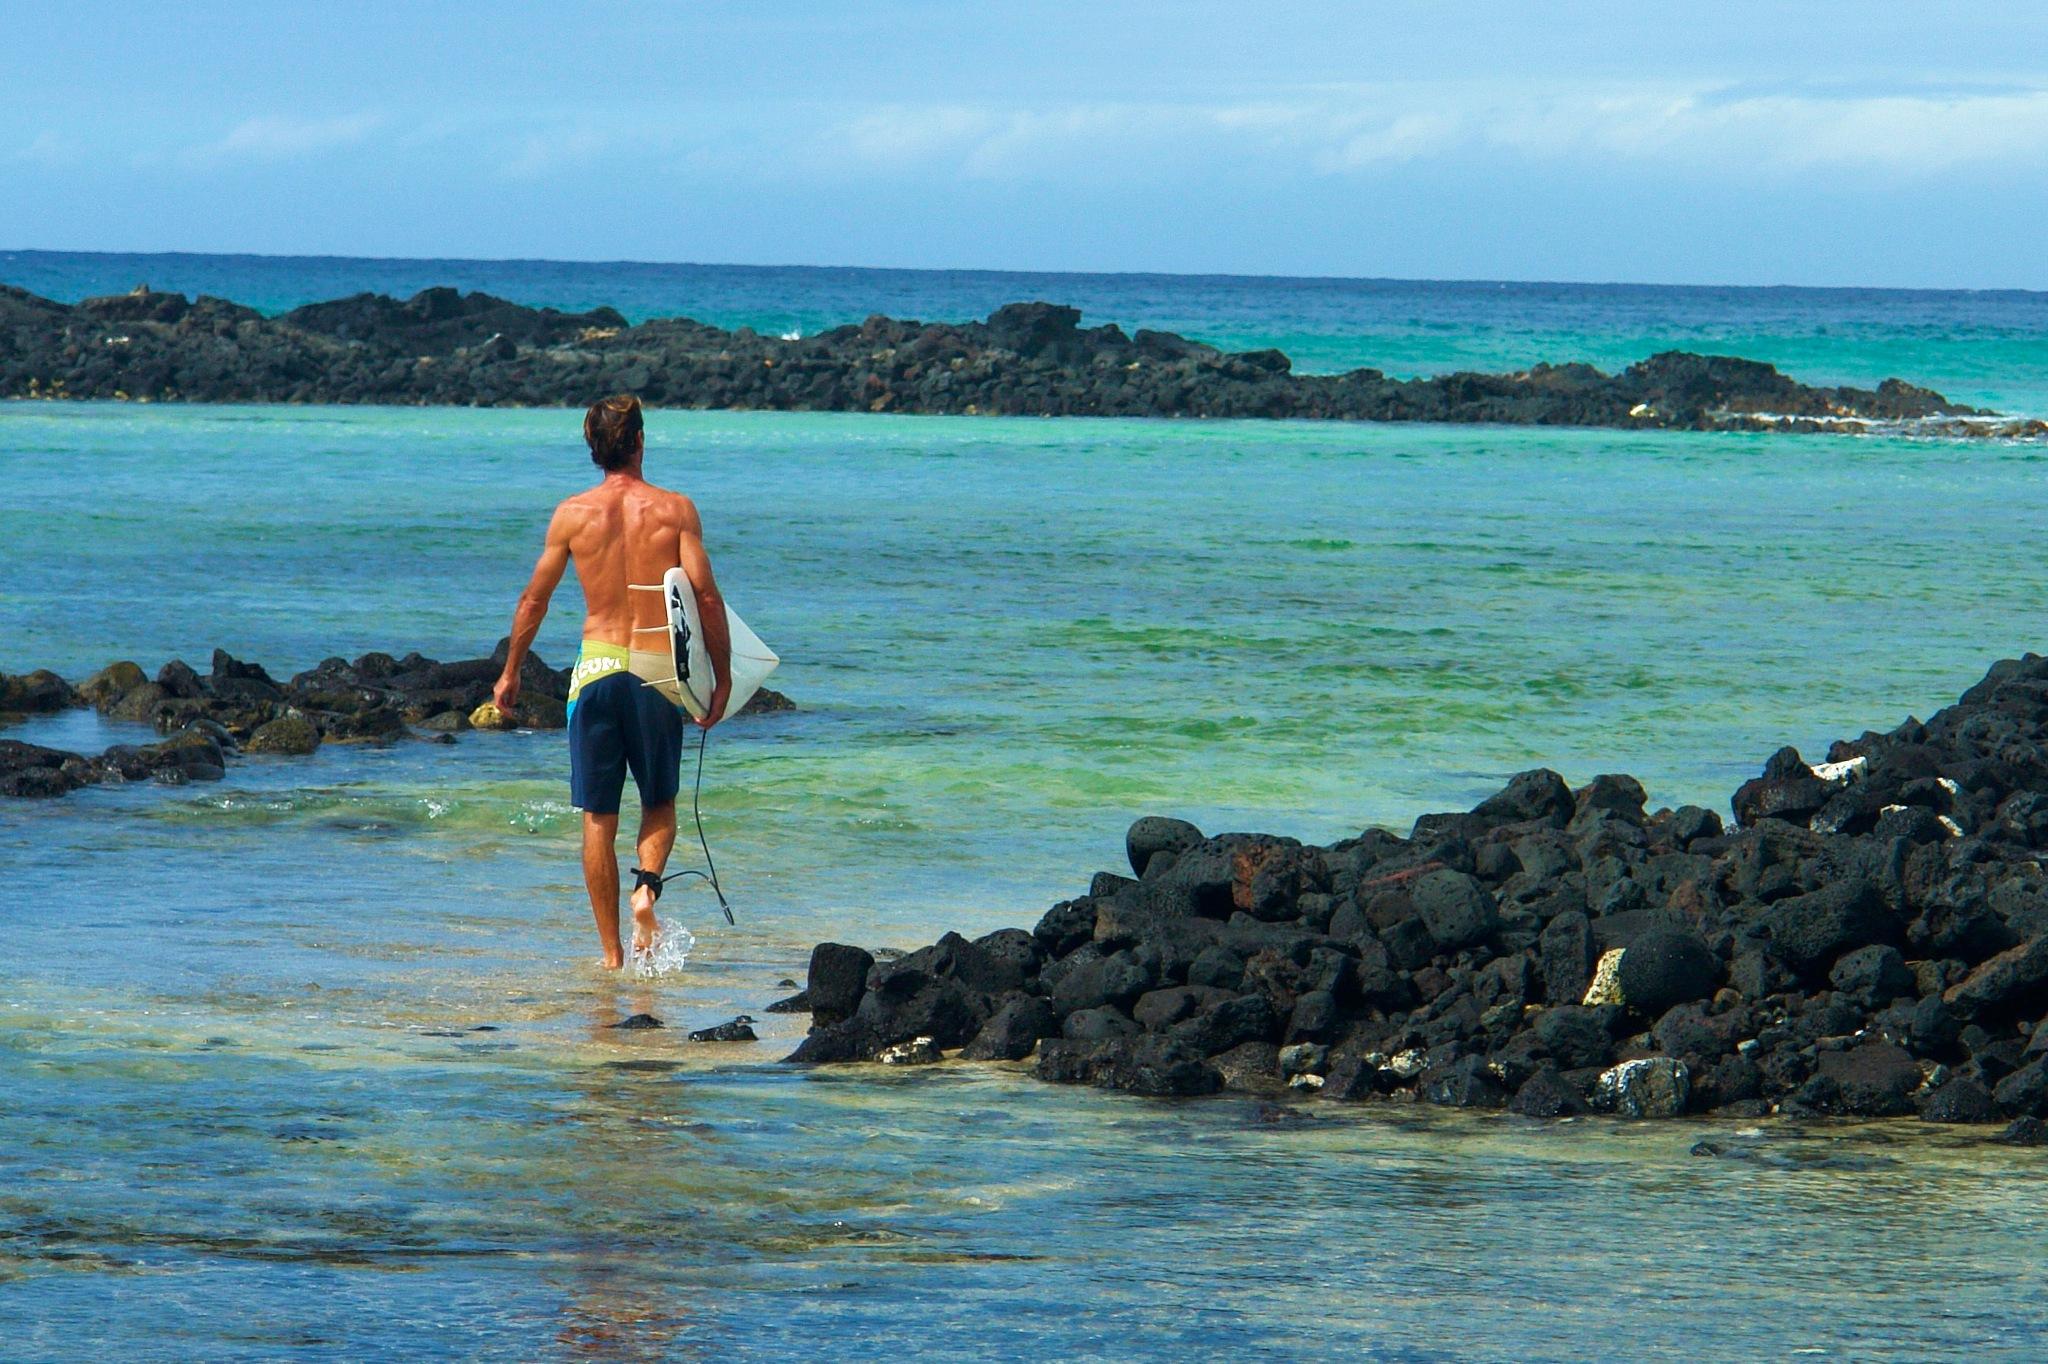 Kona surfer by Miloliidrifter